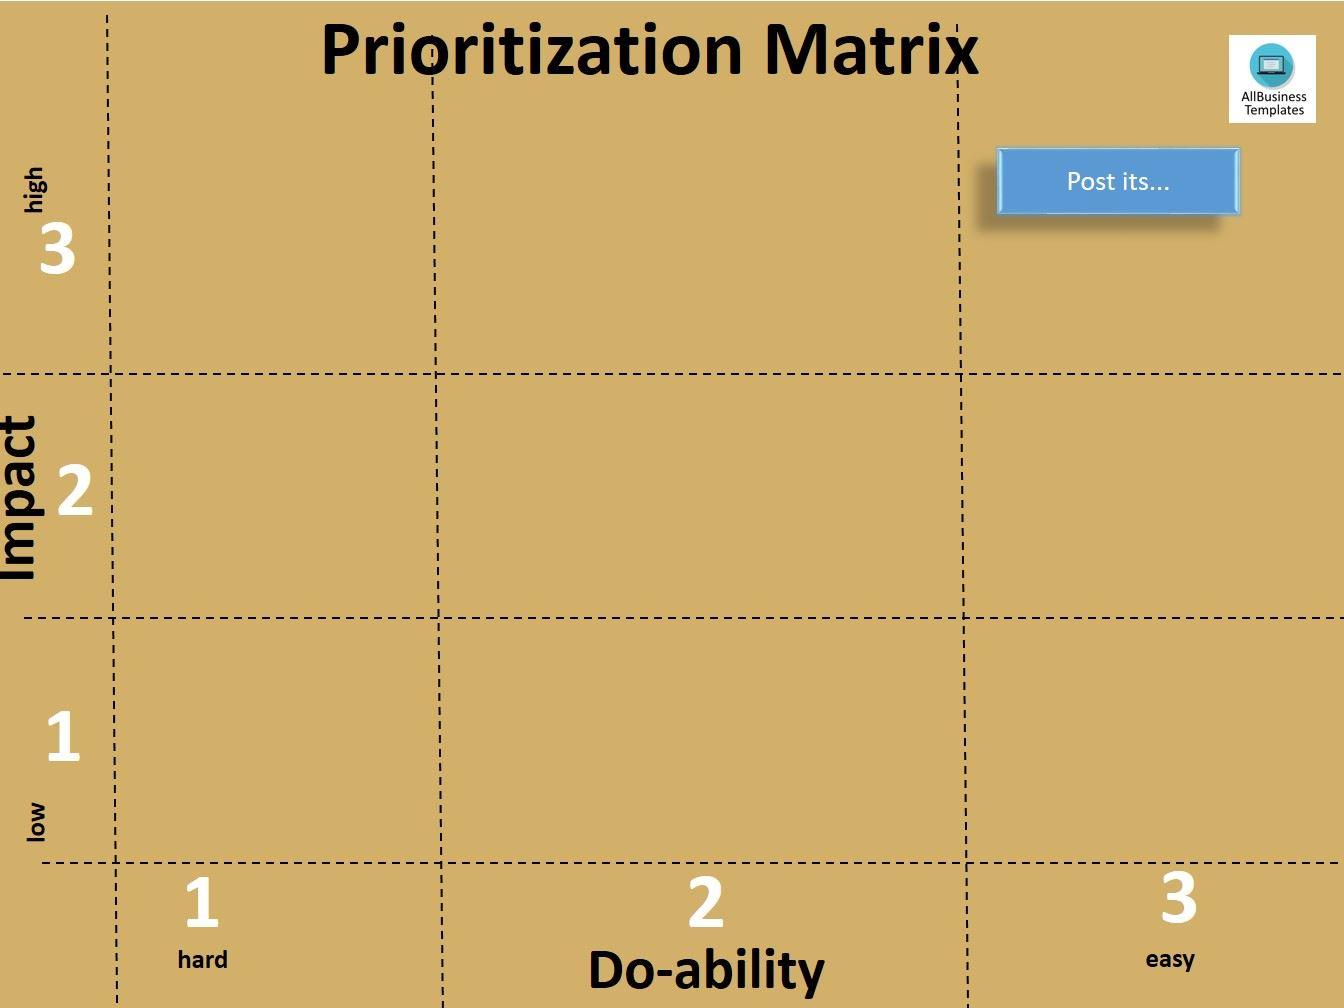 free prioritization matrix a3 templates at. Black Bedroom Furniture Sets. Home Design Ideas